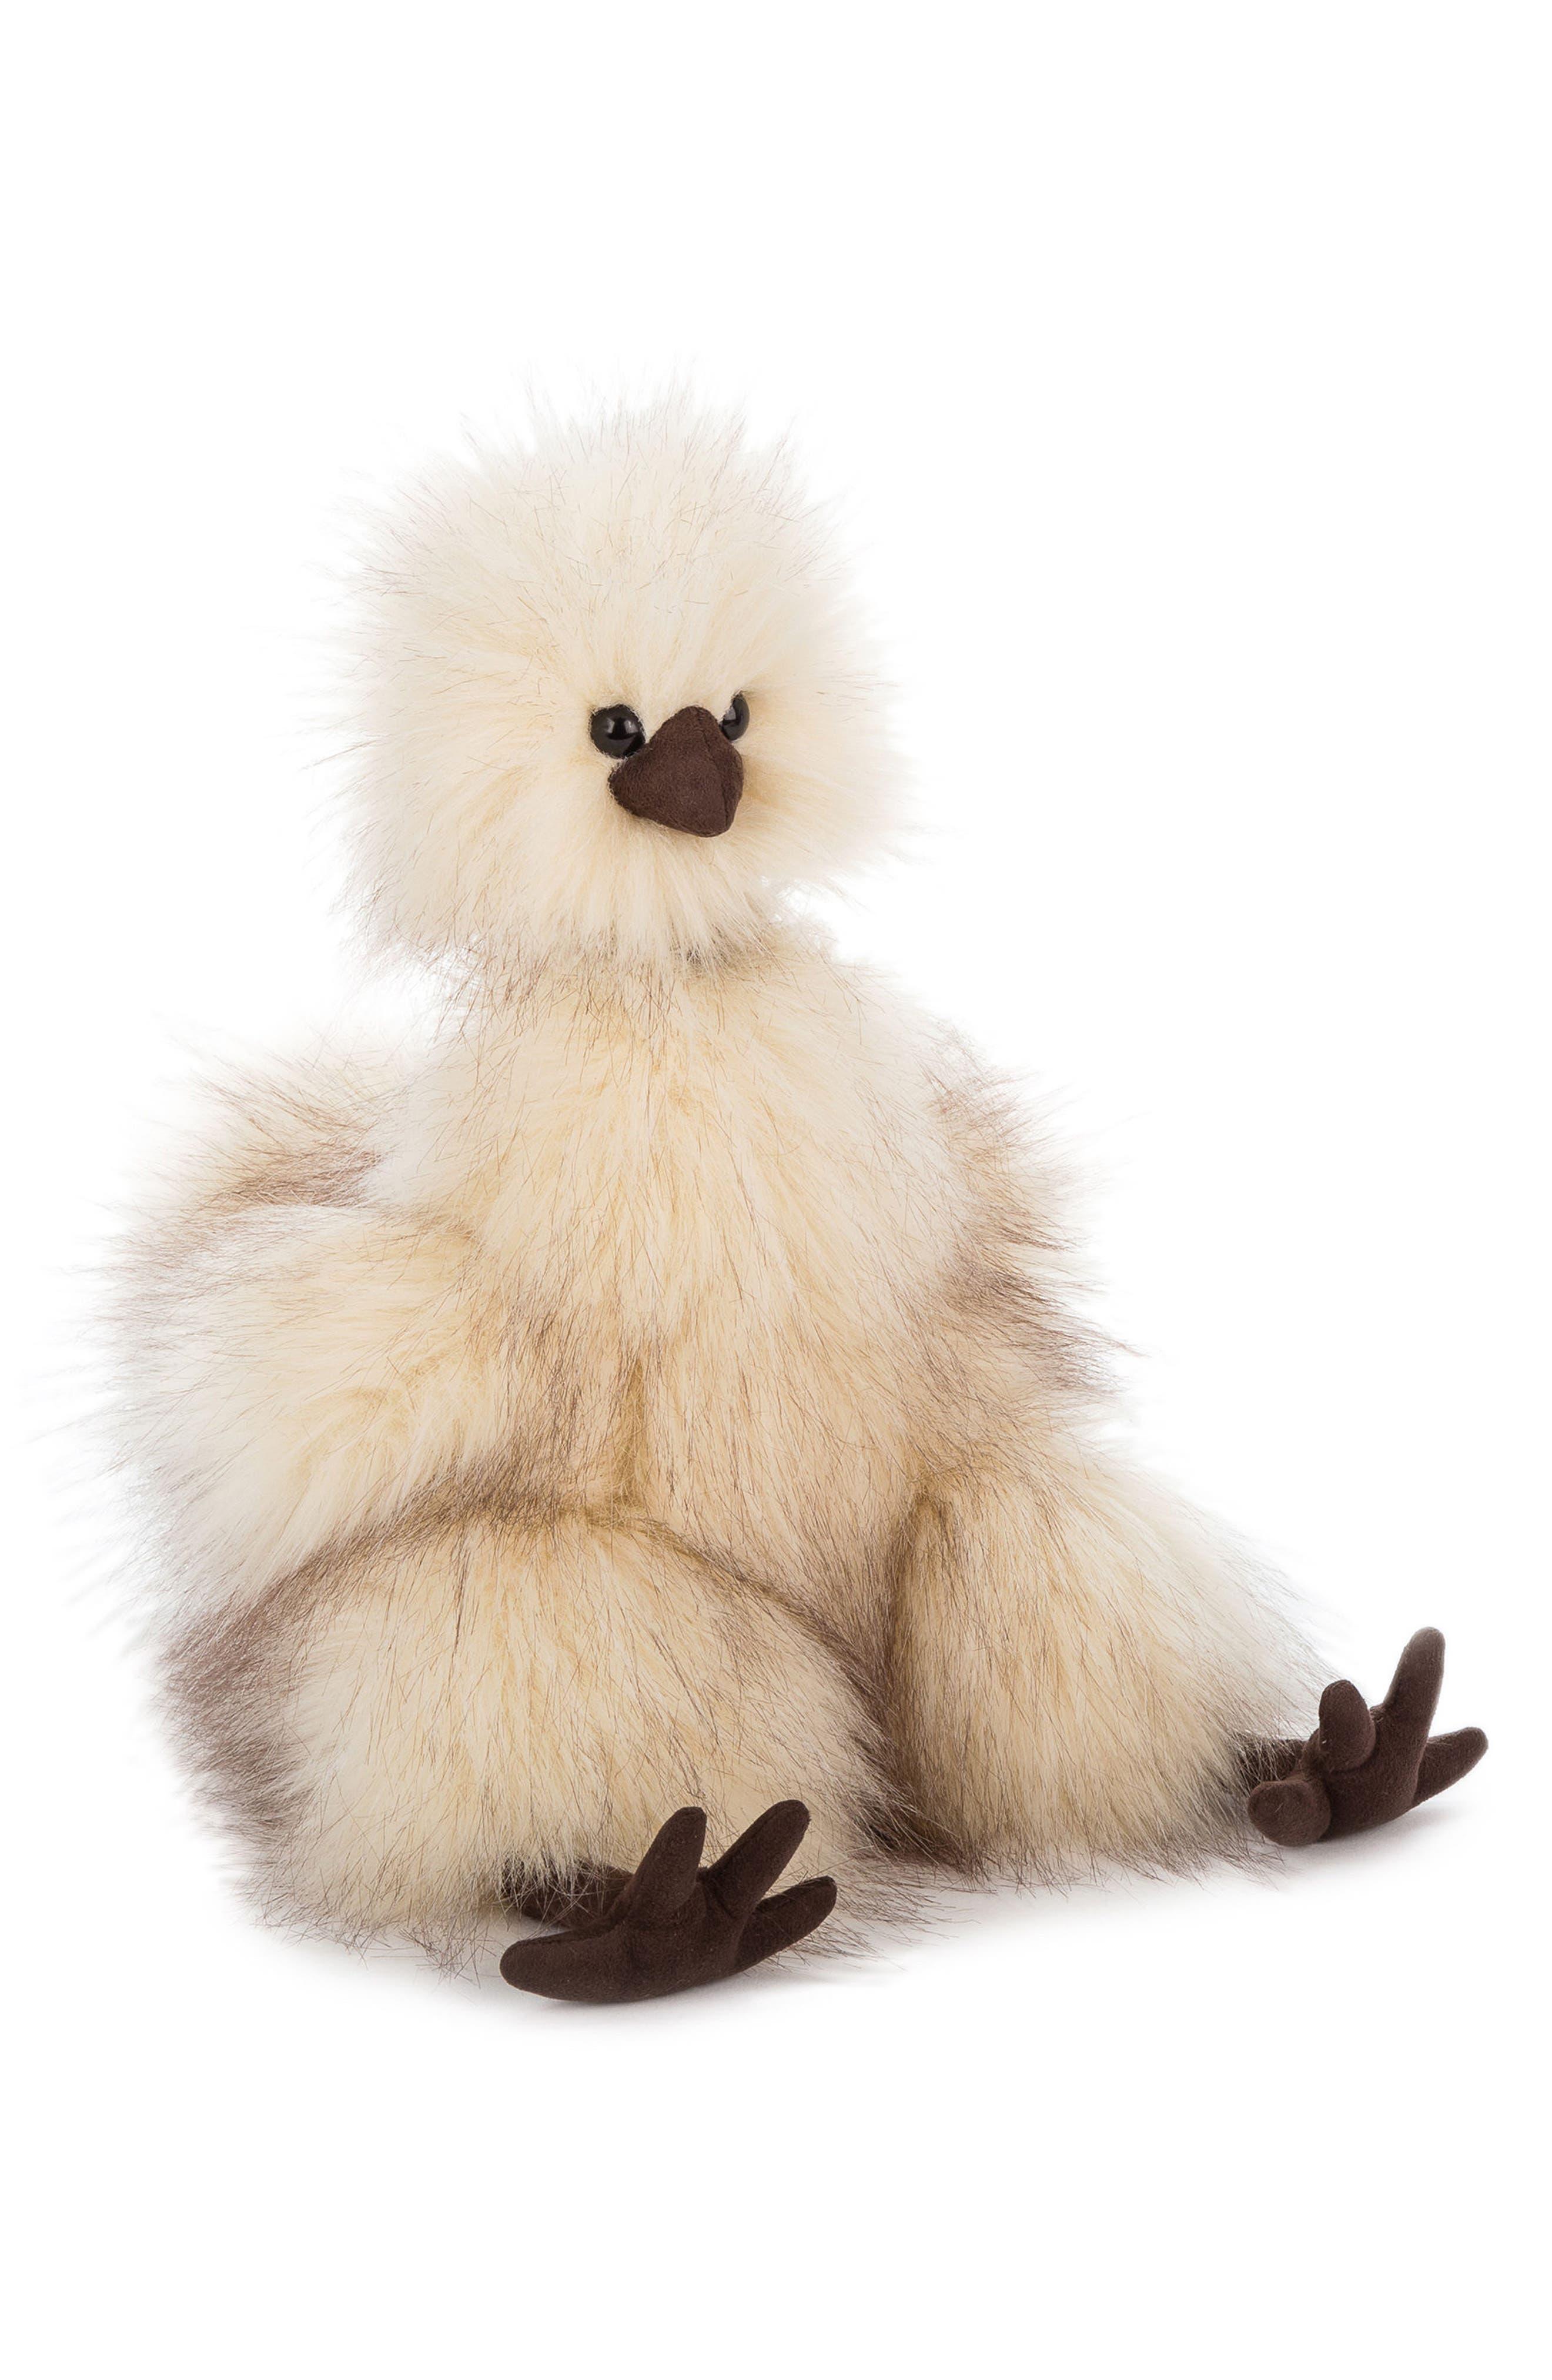 Main Image - Jellycat Silkie Chicken Stuffed Toy